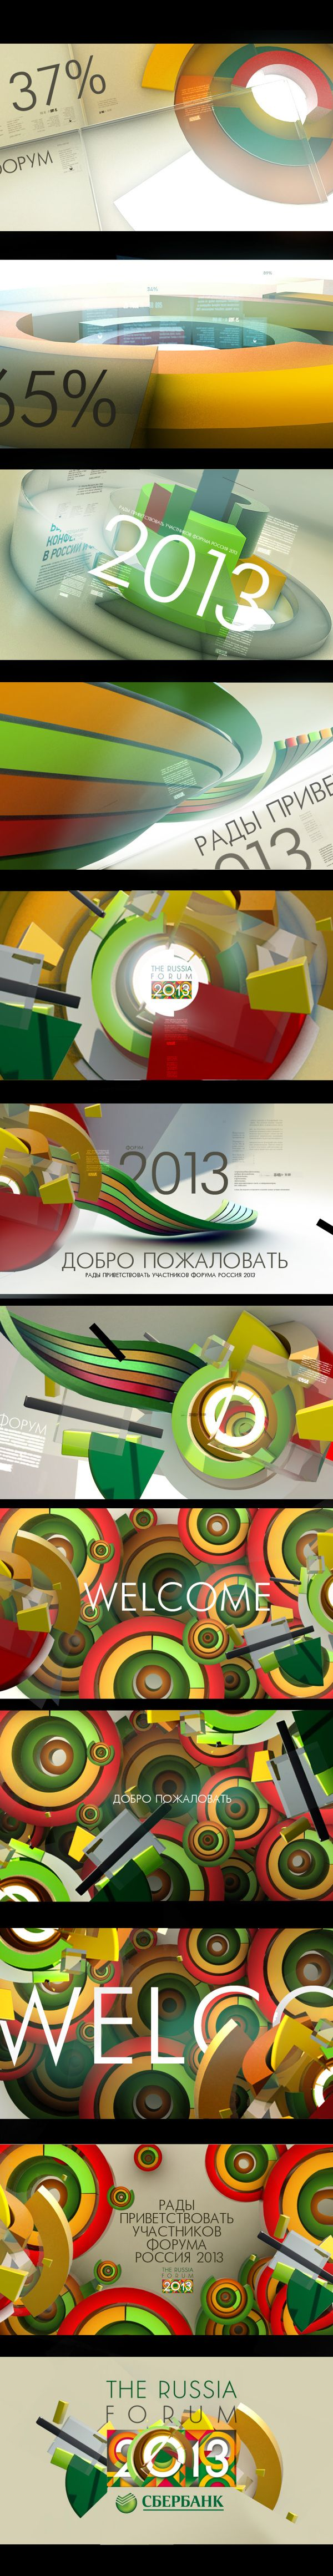 motion graphics/ storyboards/ styleframes   SBER_FORUM_2013 by Egor Antonov